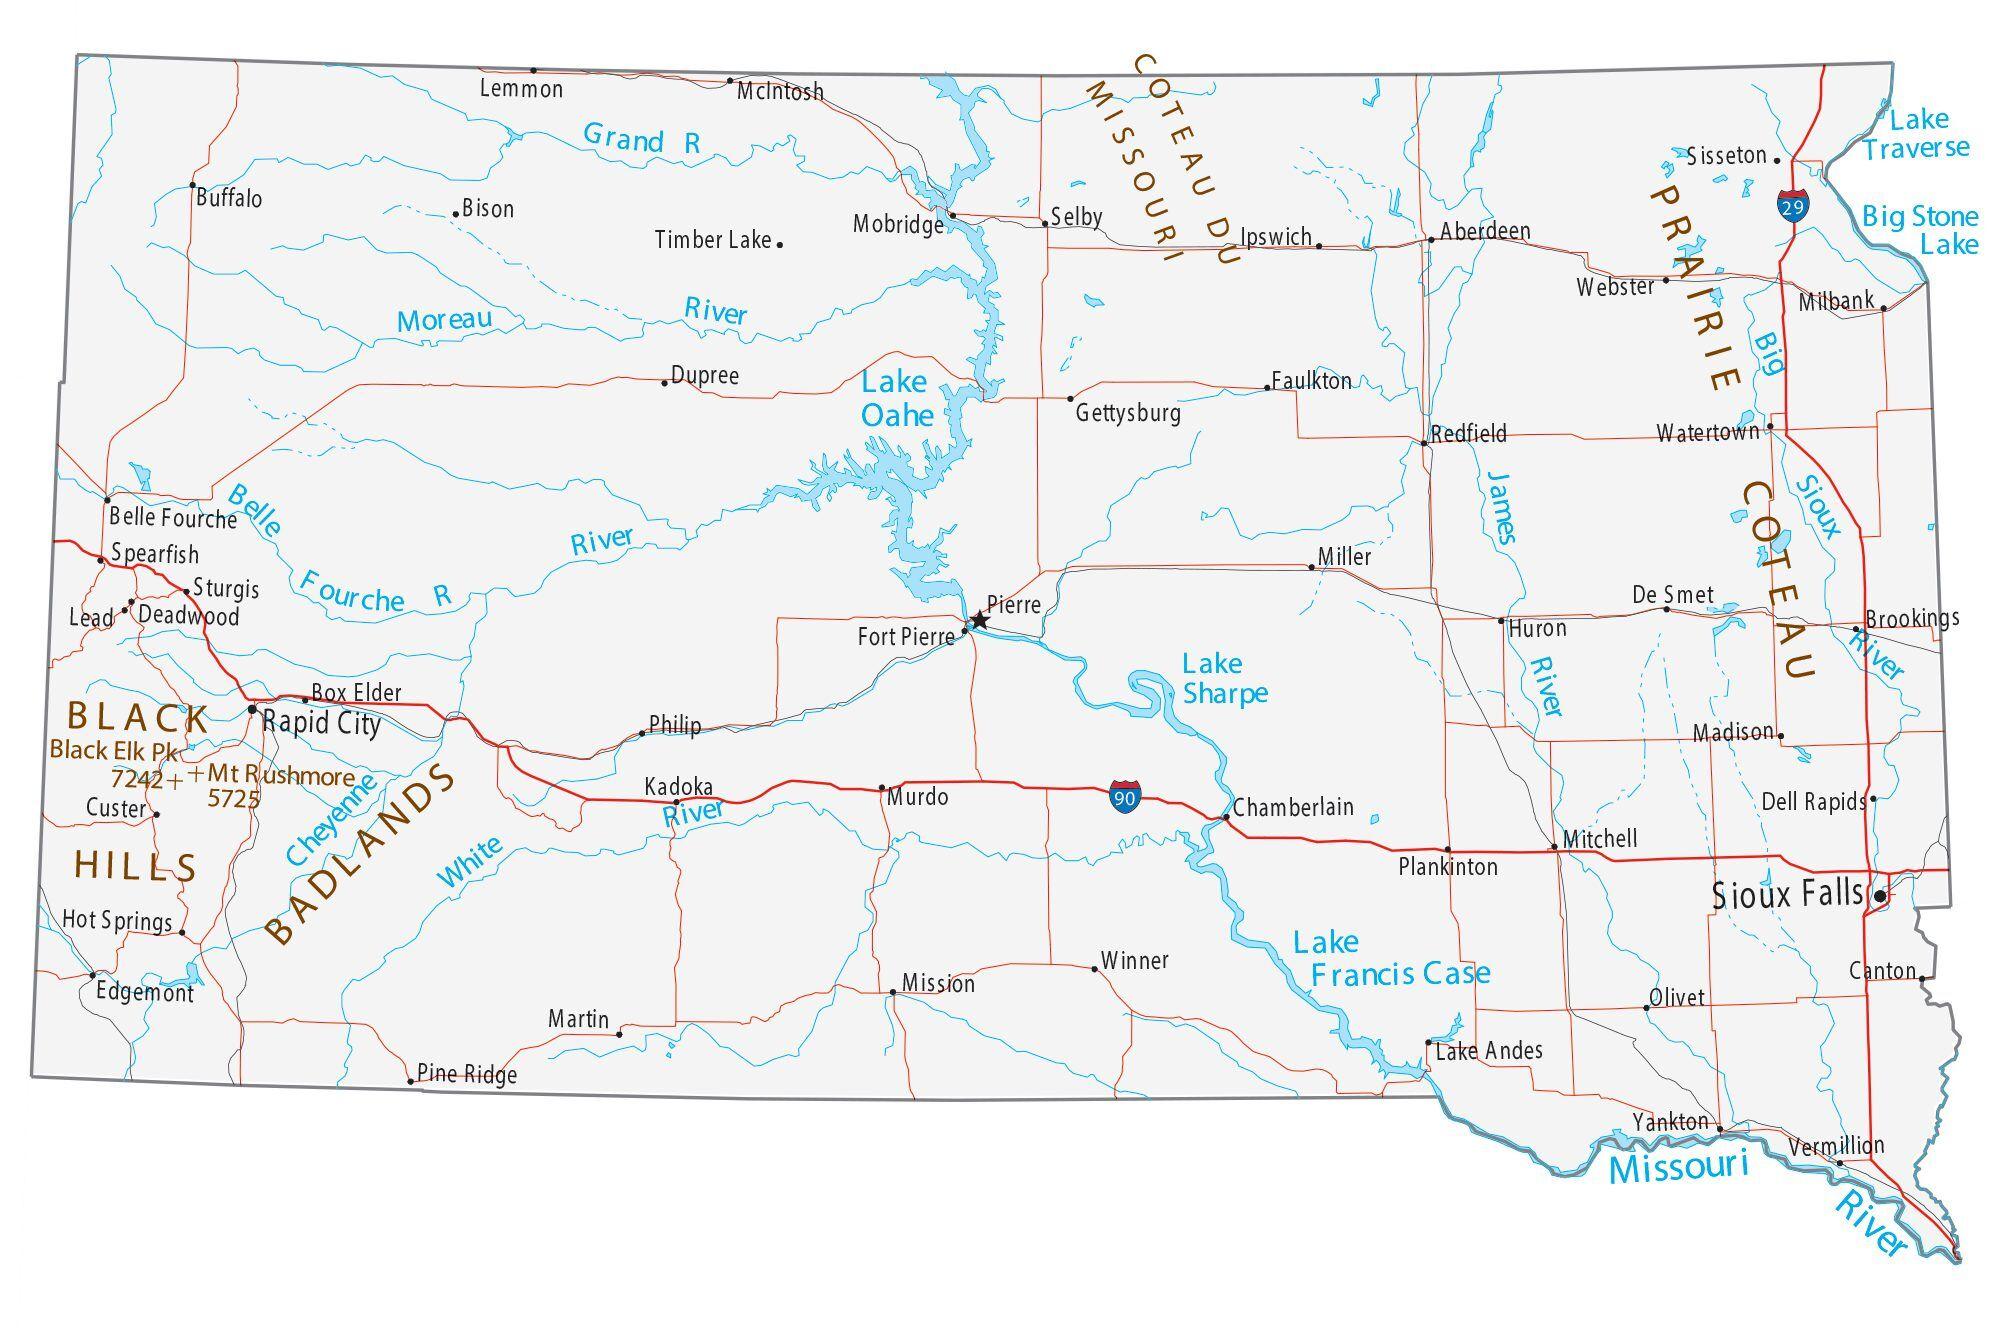 south dakota cities map Map Of South Dakota Cities And Roads Gis Geography south dakota cities map